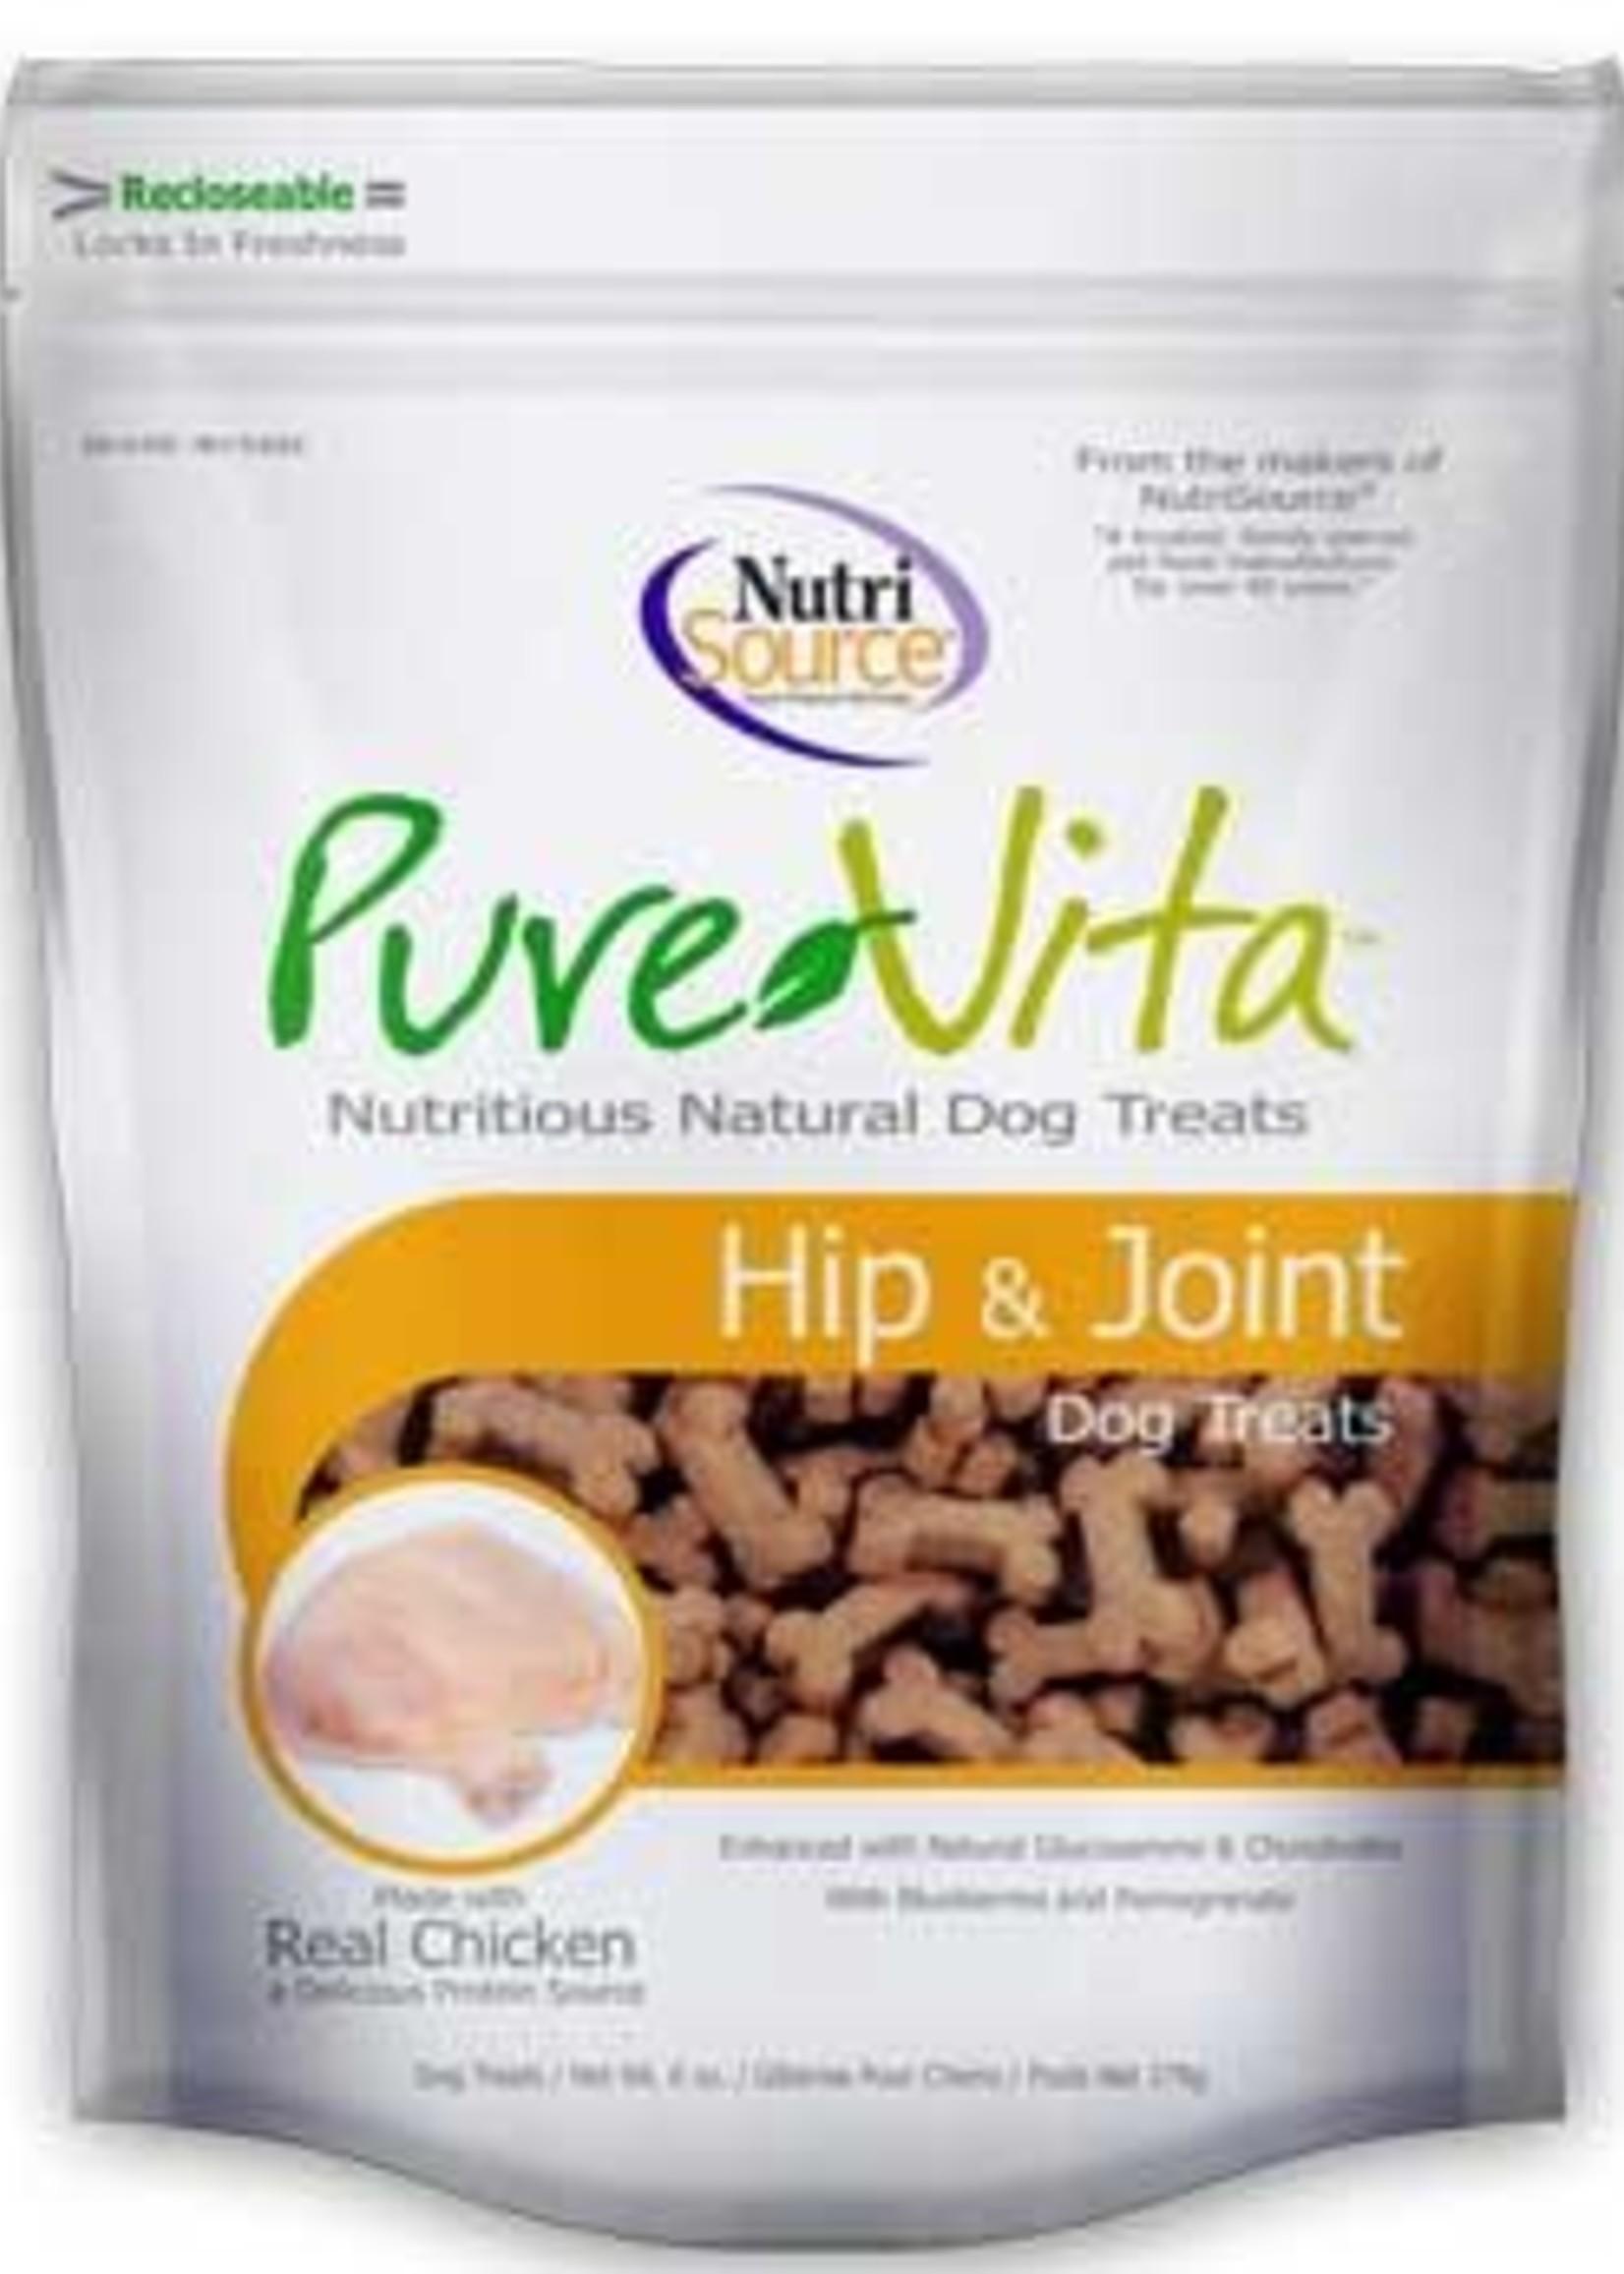 PureVita PureVita Dog Treat Hip & Joint 6 oz